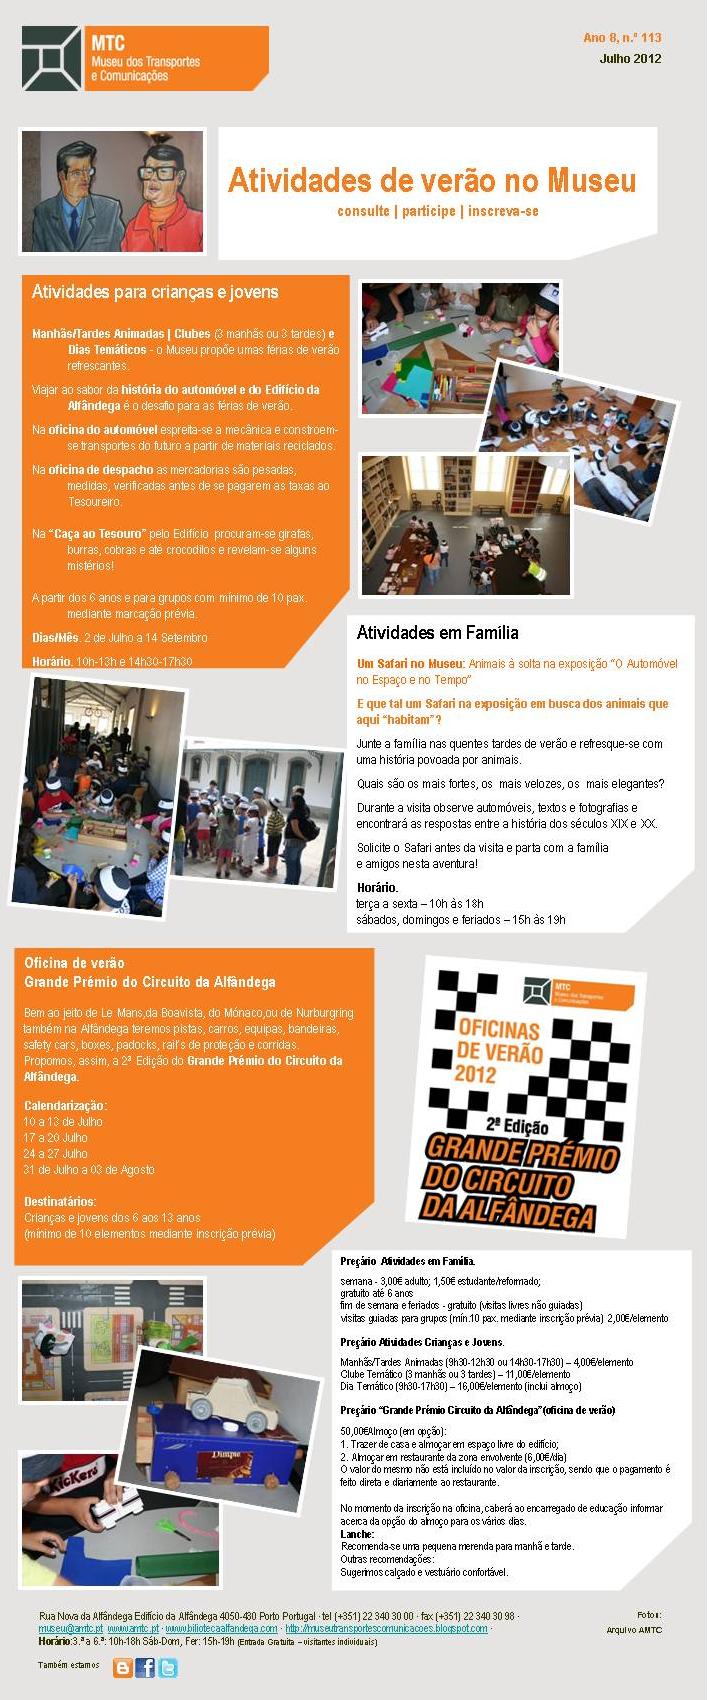 actividades_verao_museu_transportes